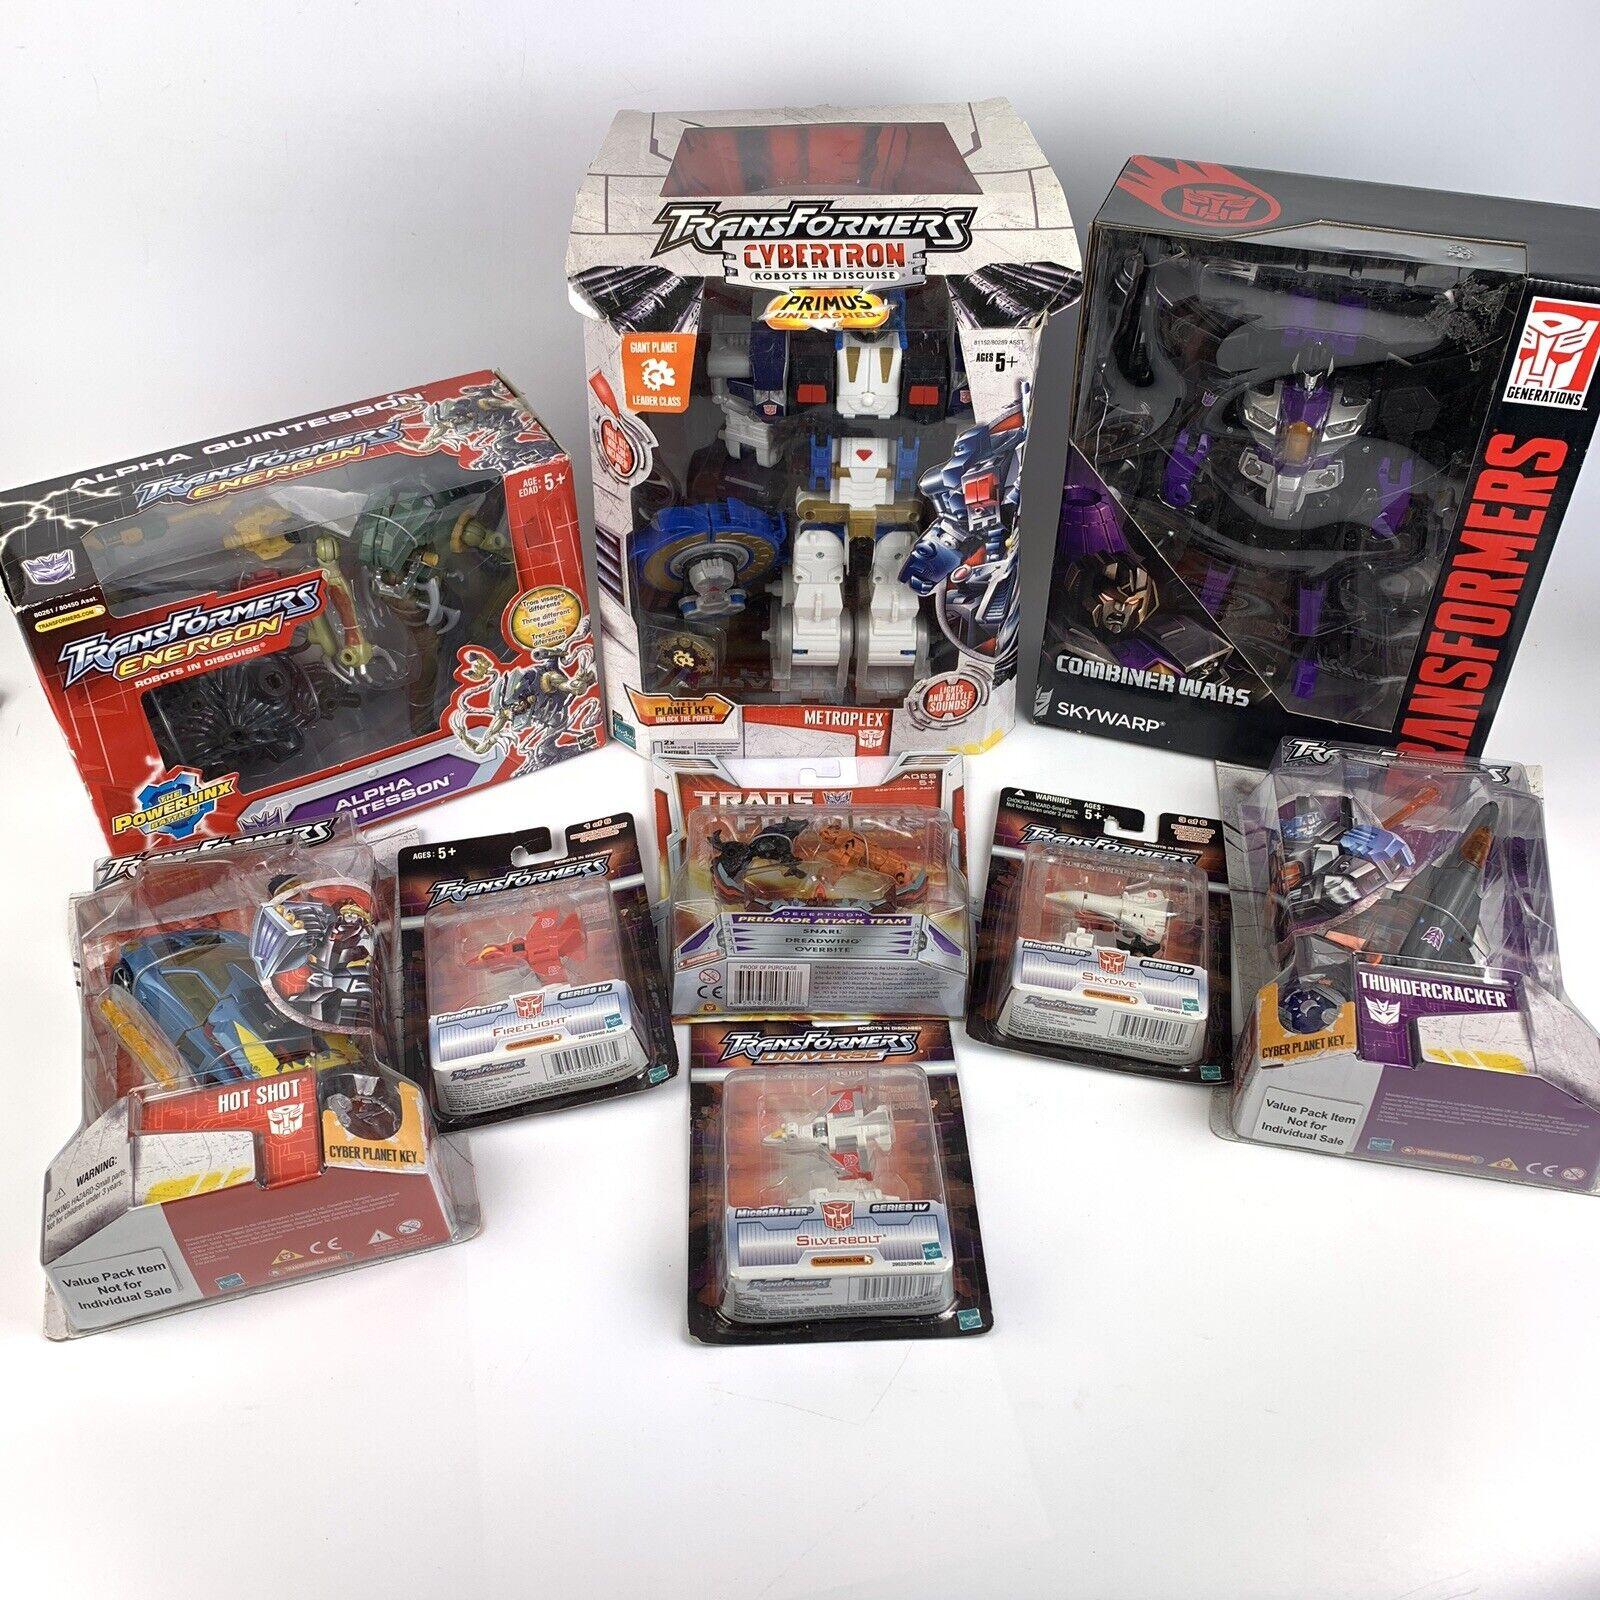 Transformers, 9  United War, Energy, Cybertron Airways, 2005.